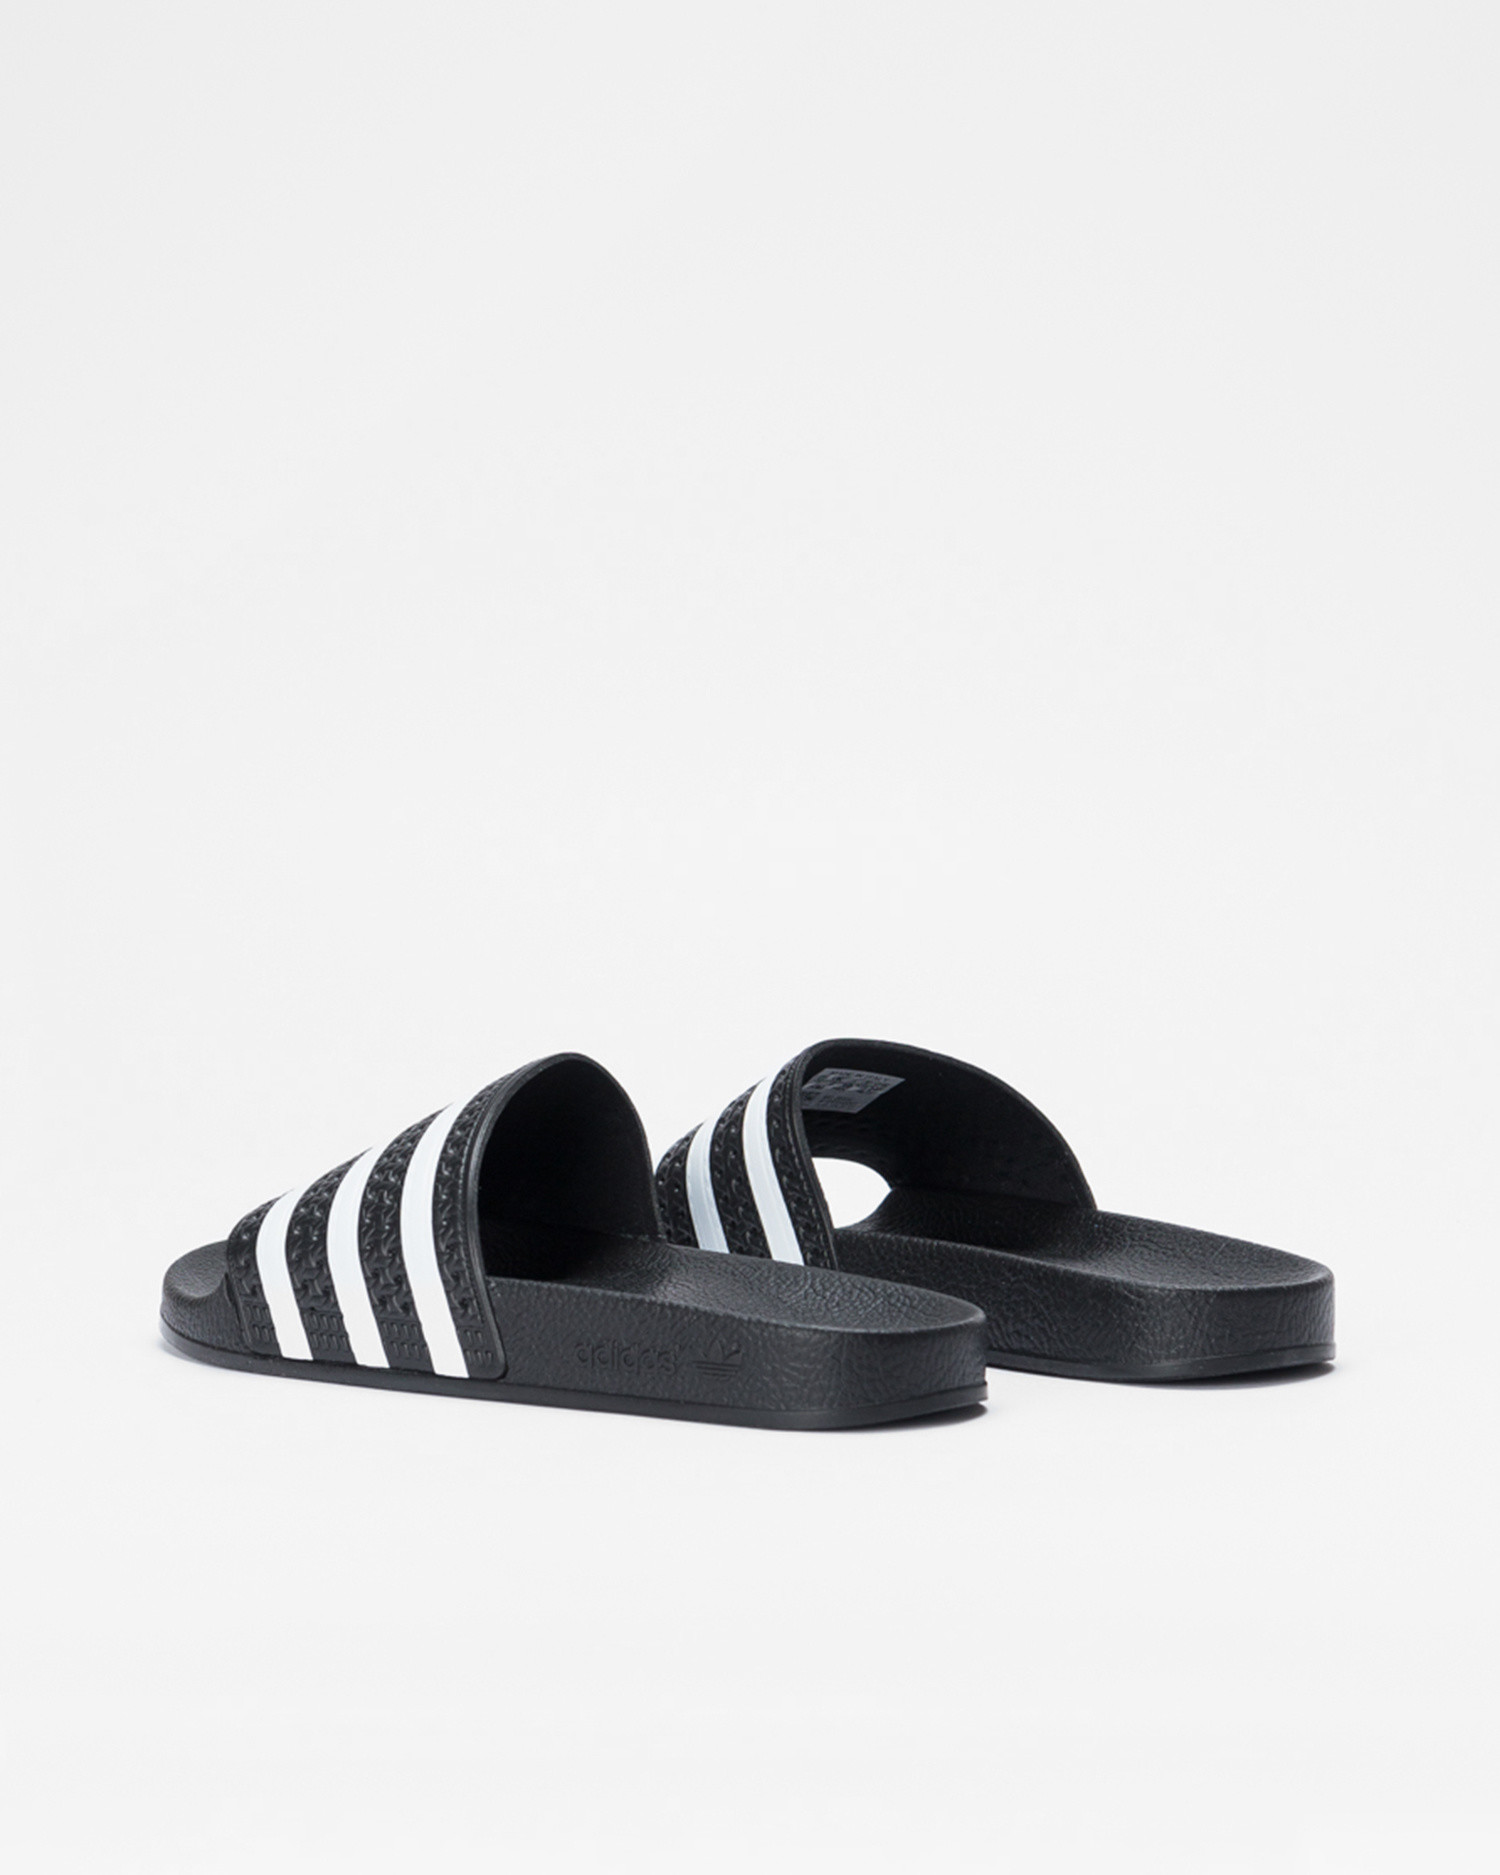 Adidas Adilette  Cblack/White/Cblack